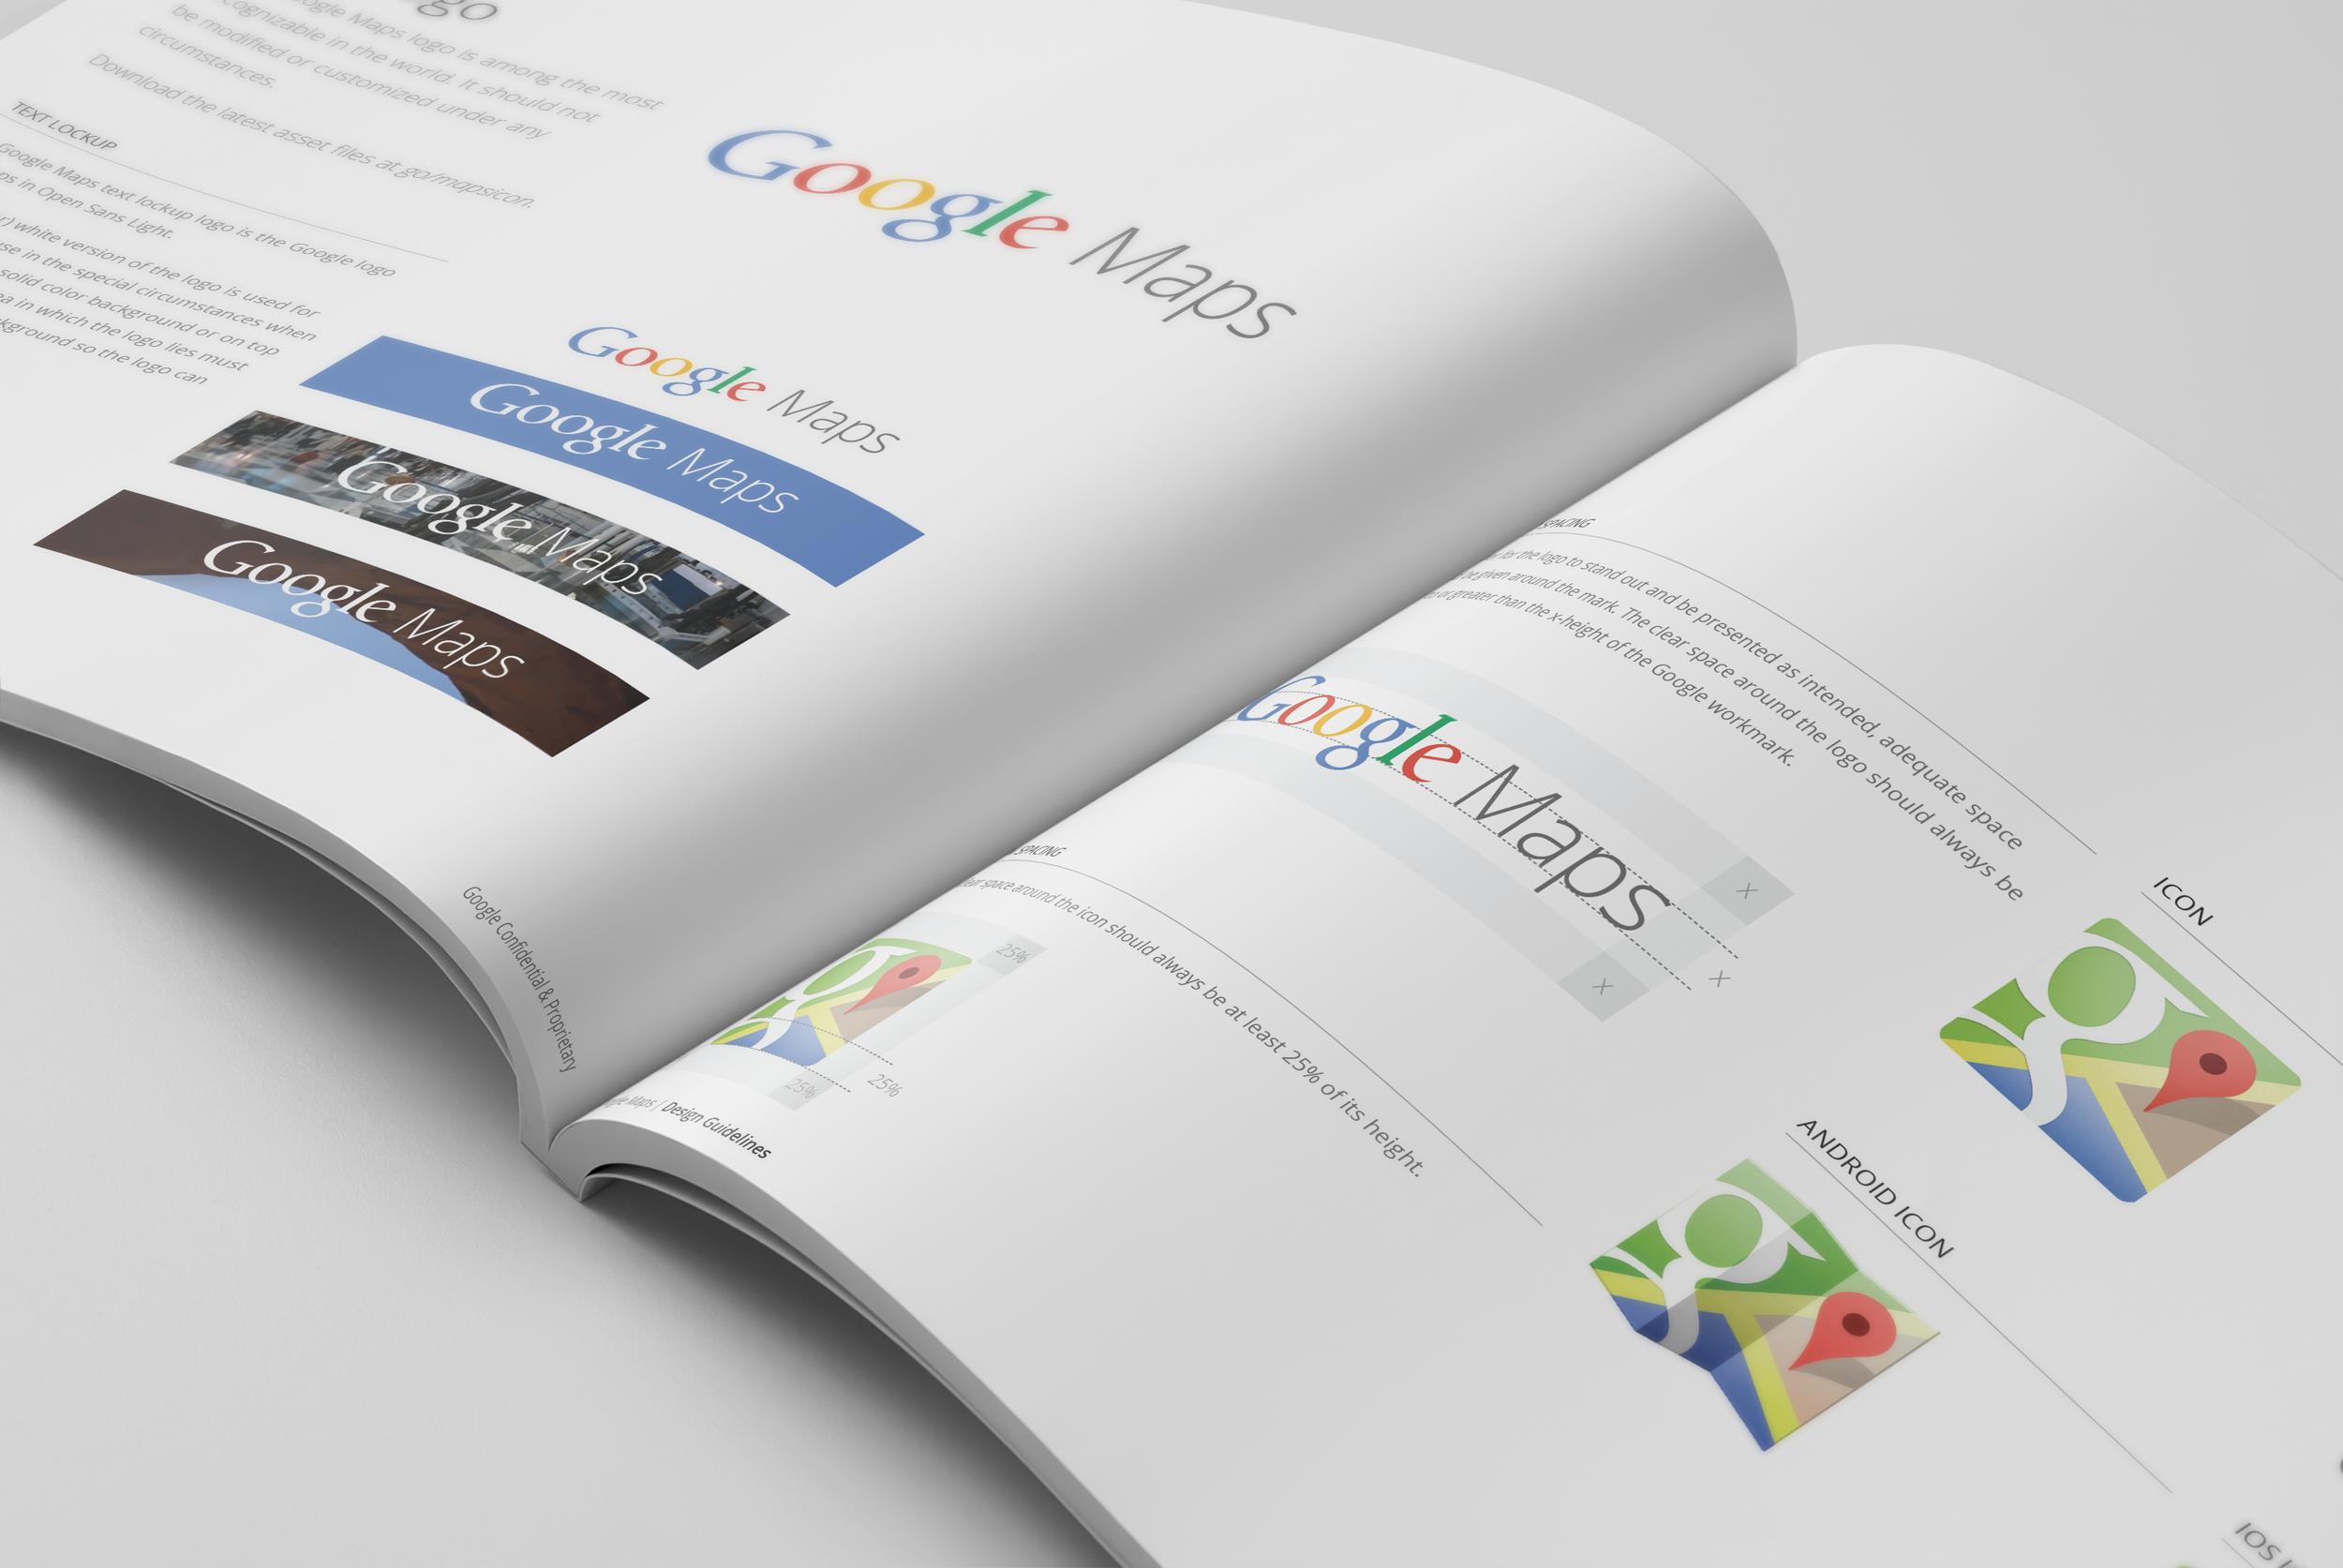 5-google_0913_book.png